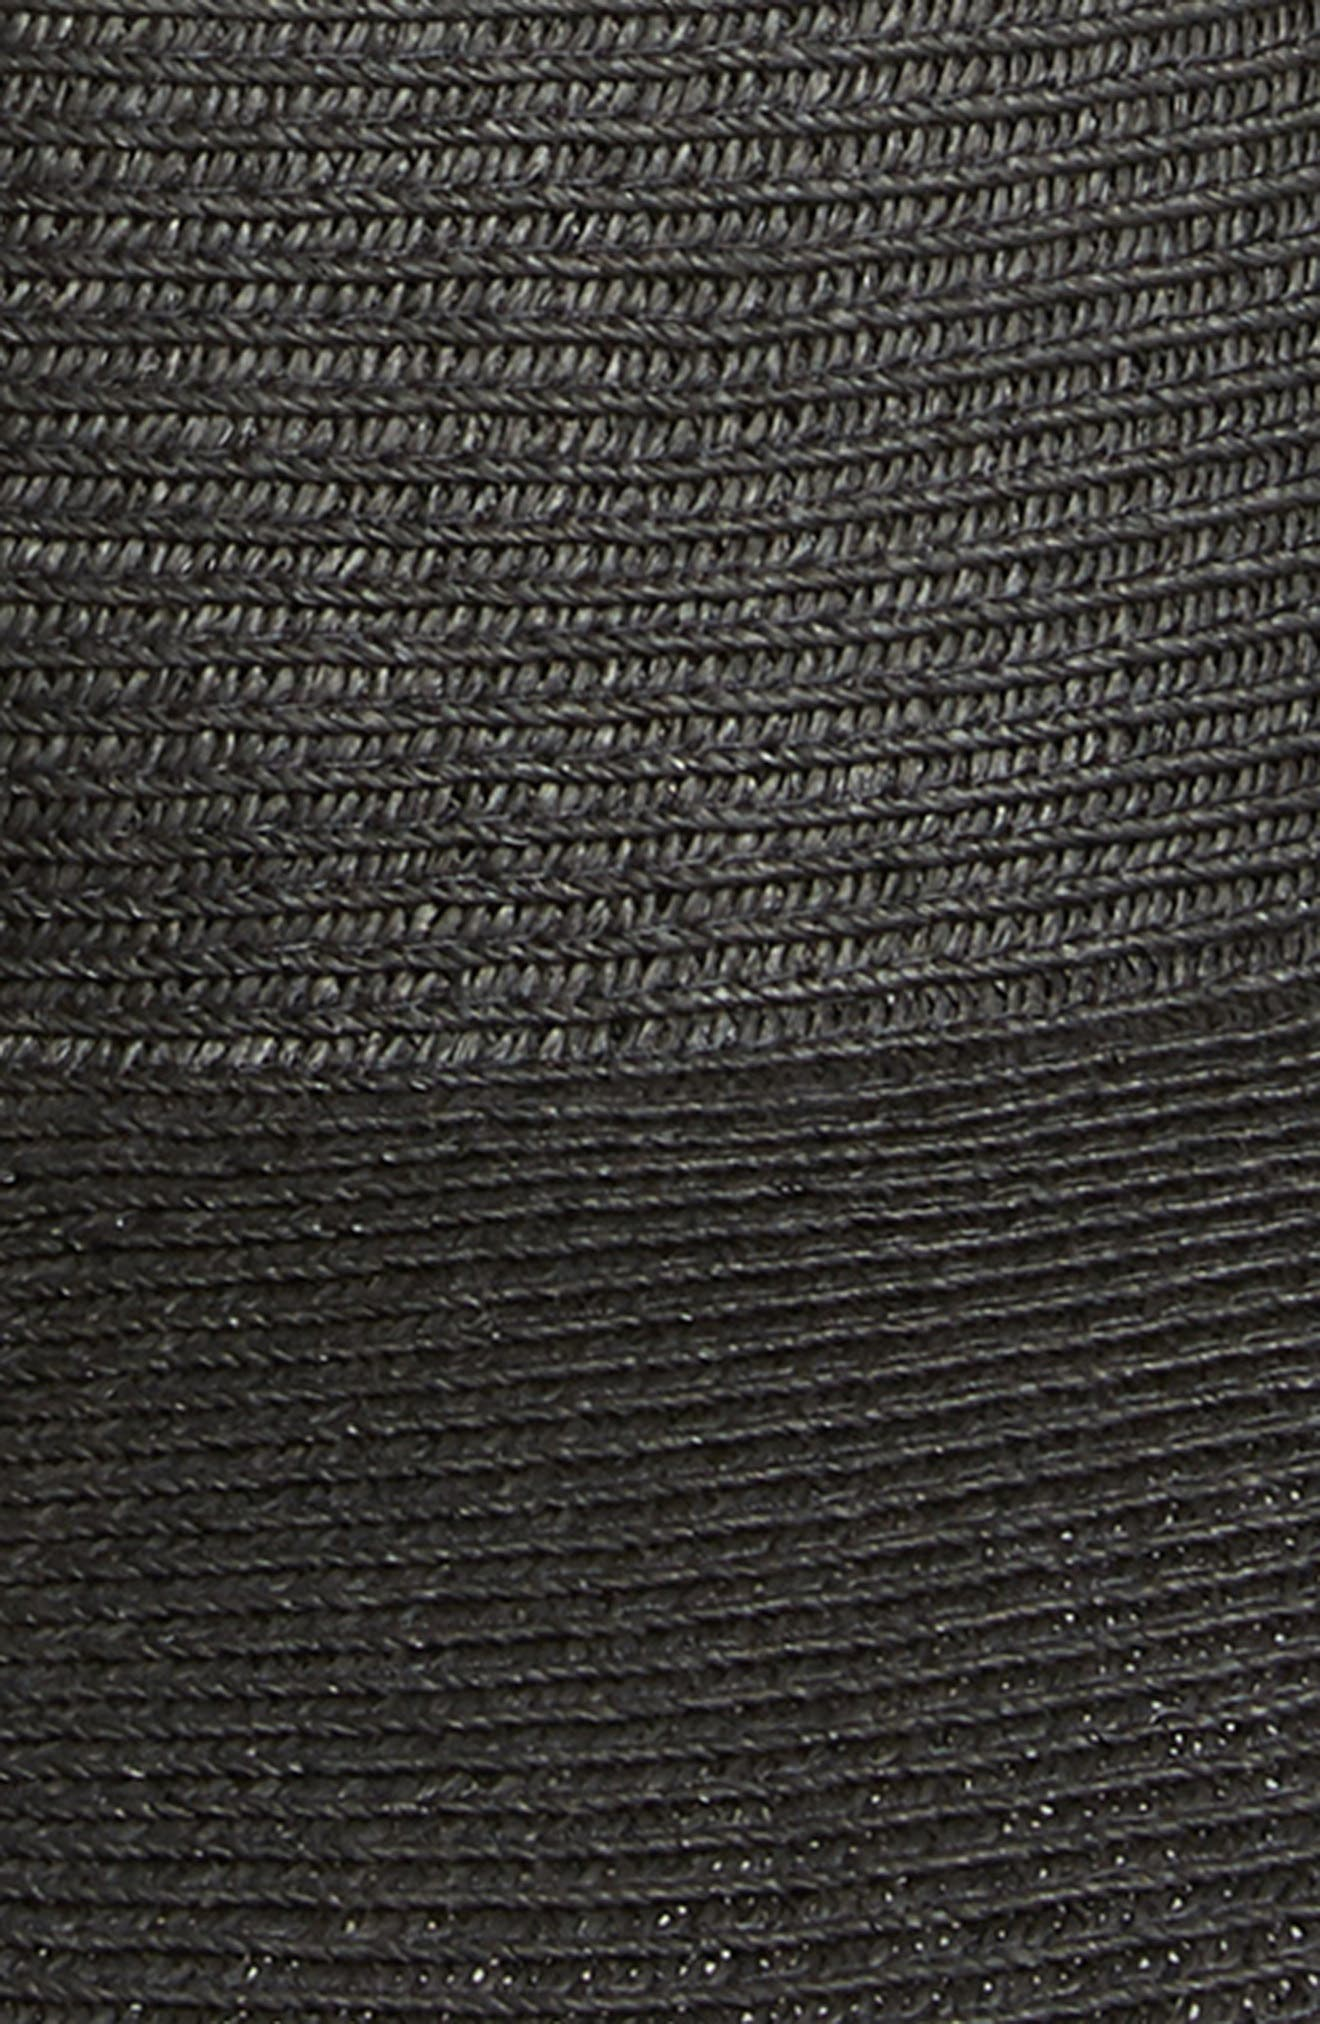 Ultrabraid XL Brim Hat,                             Alternate thumbnail 2, color,                             BLACK